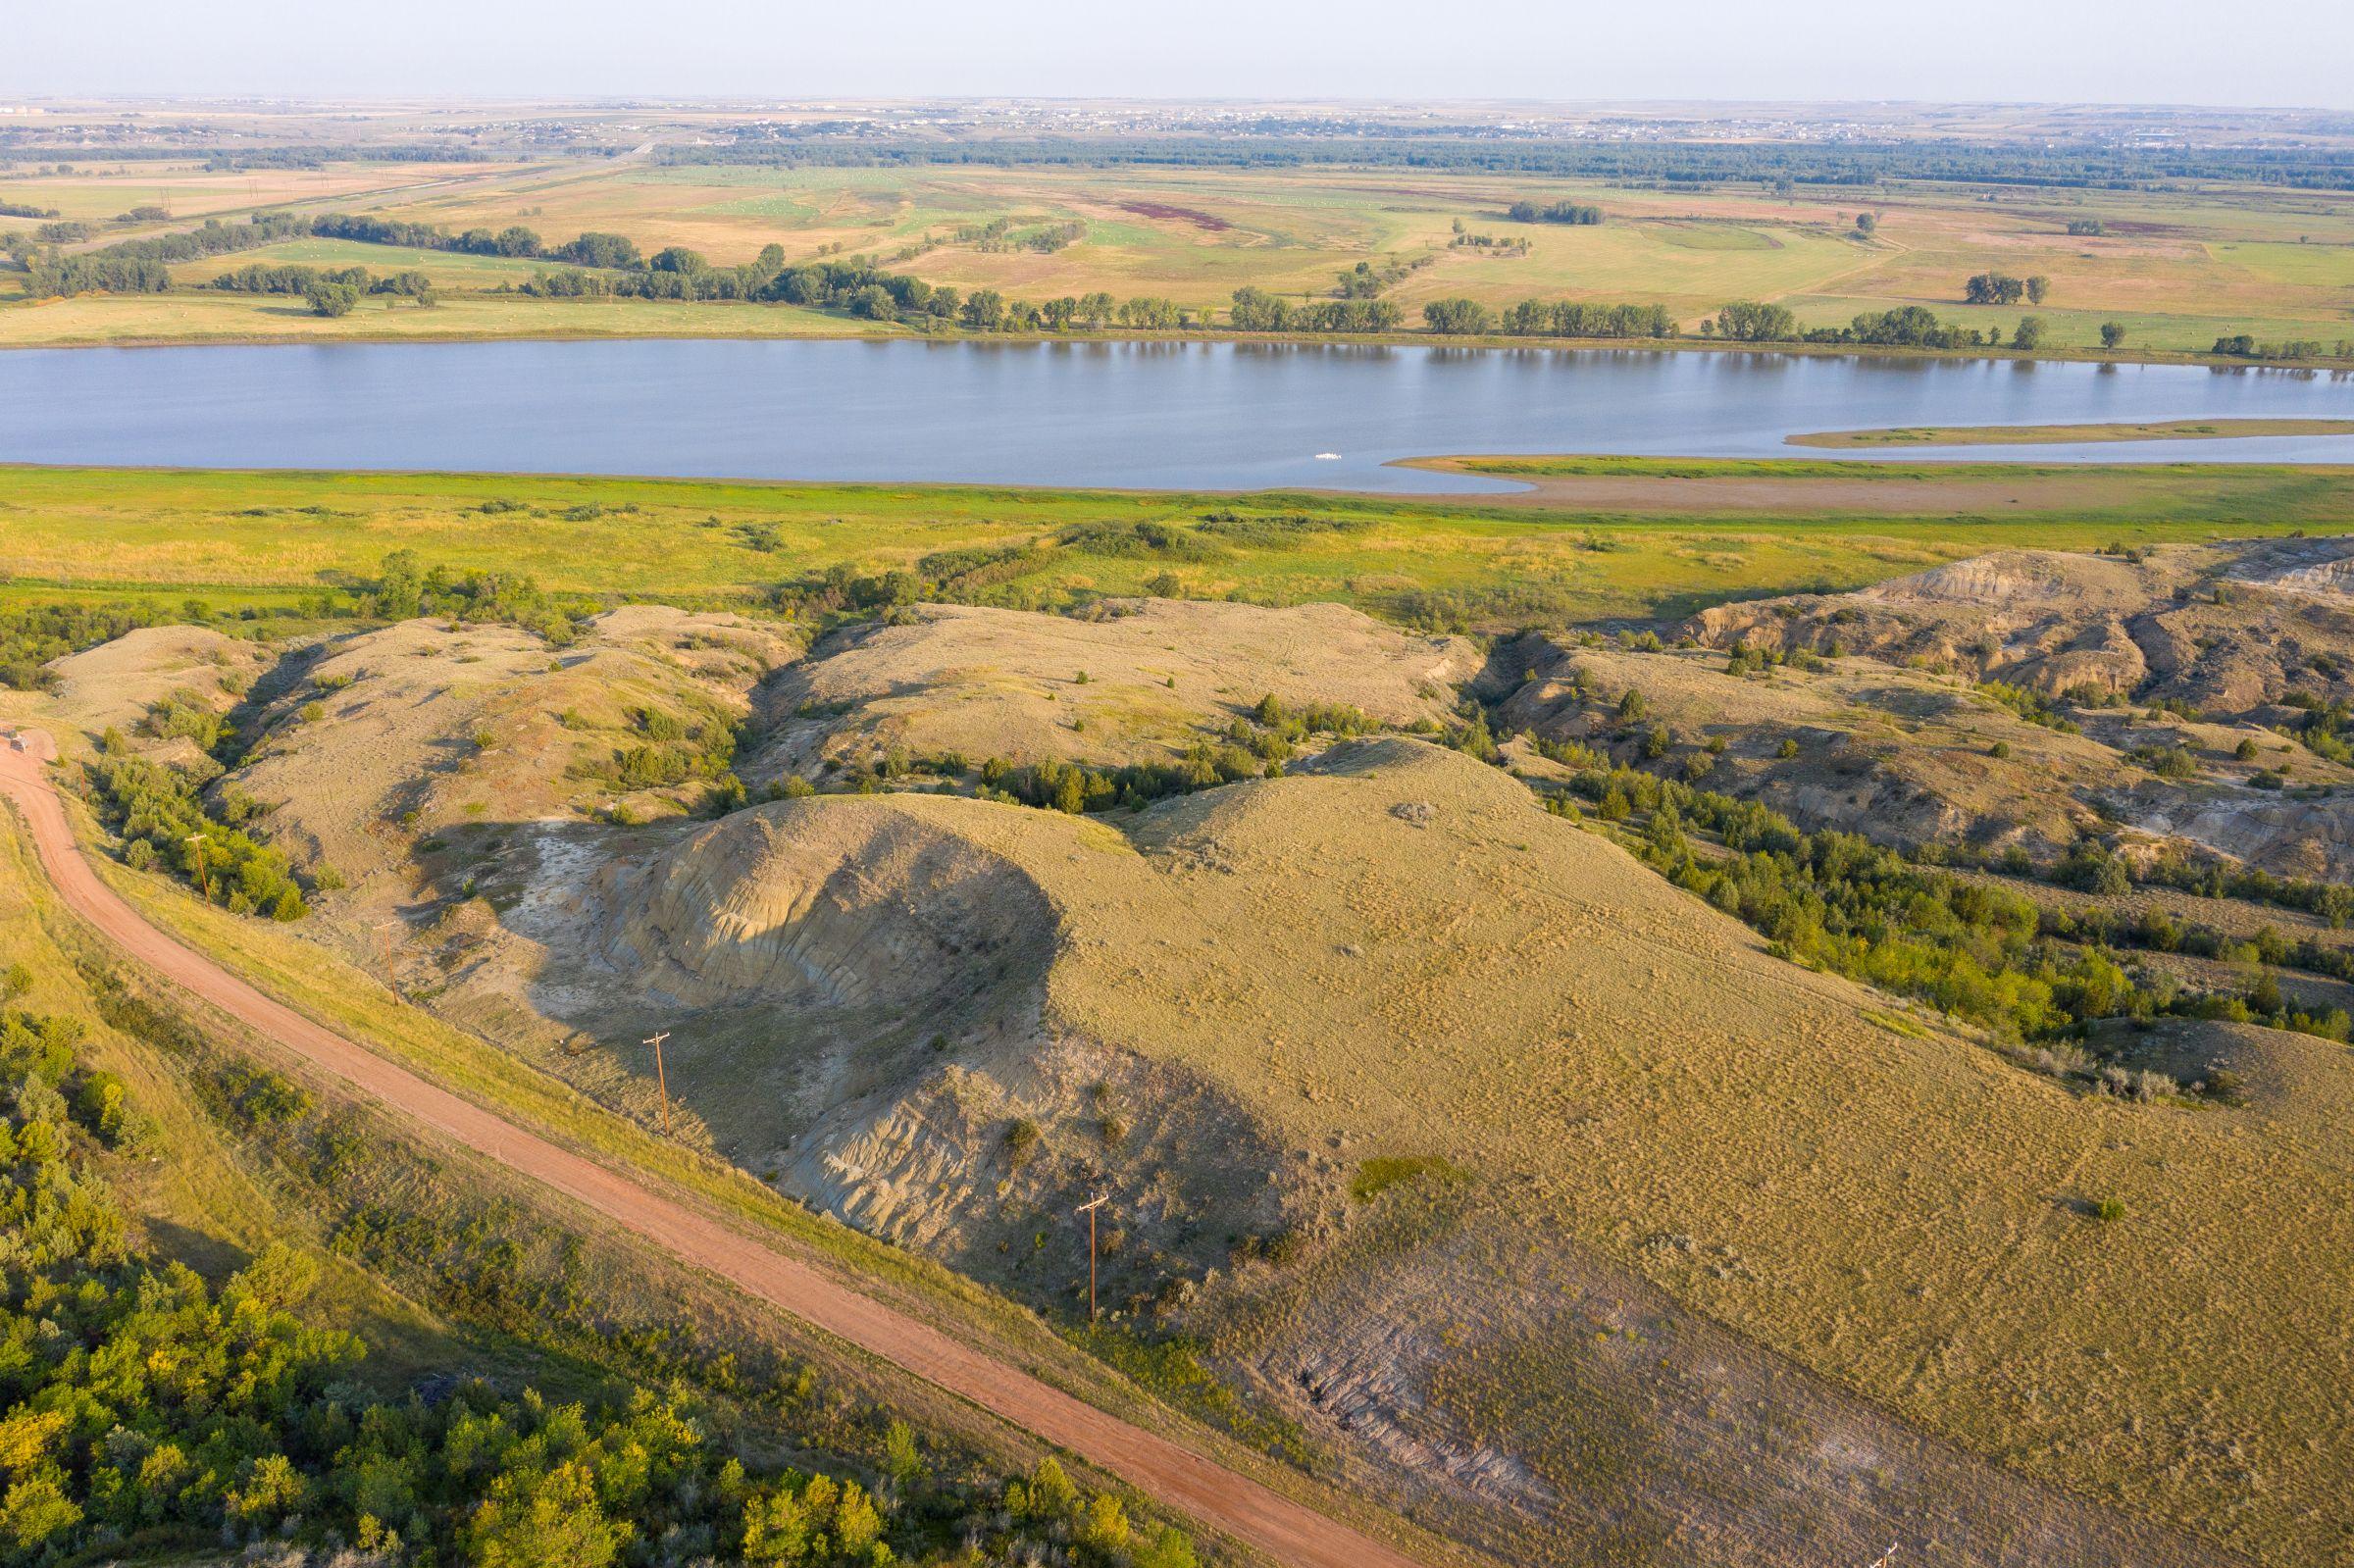 auctions-land-mckenzie-county-north-dakota-270-acres-listing-number-15735-0-2021-09-10-124711.jpeg